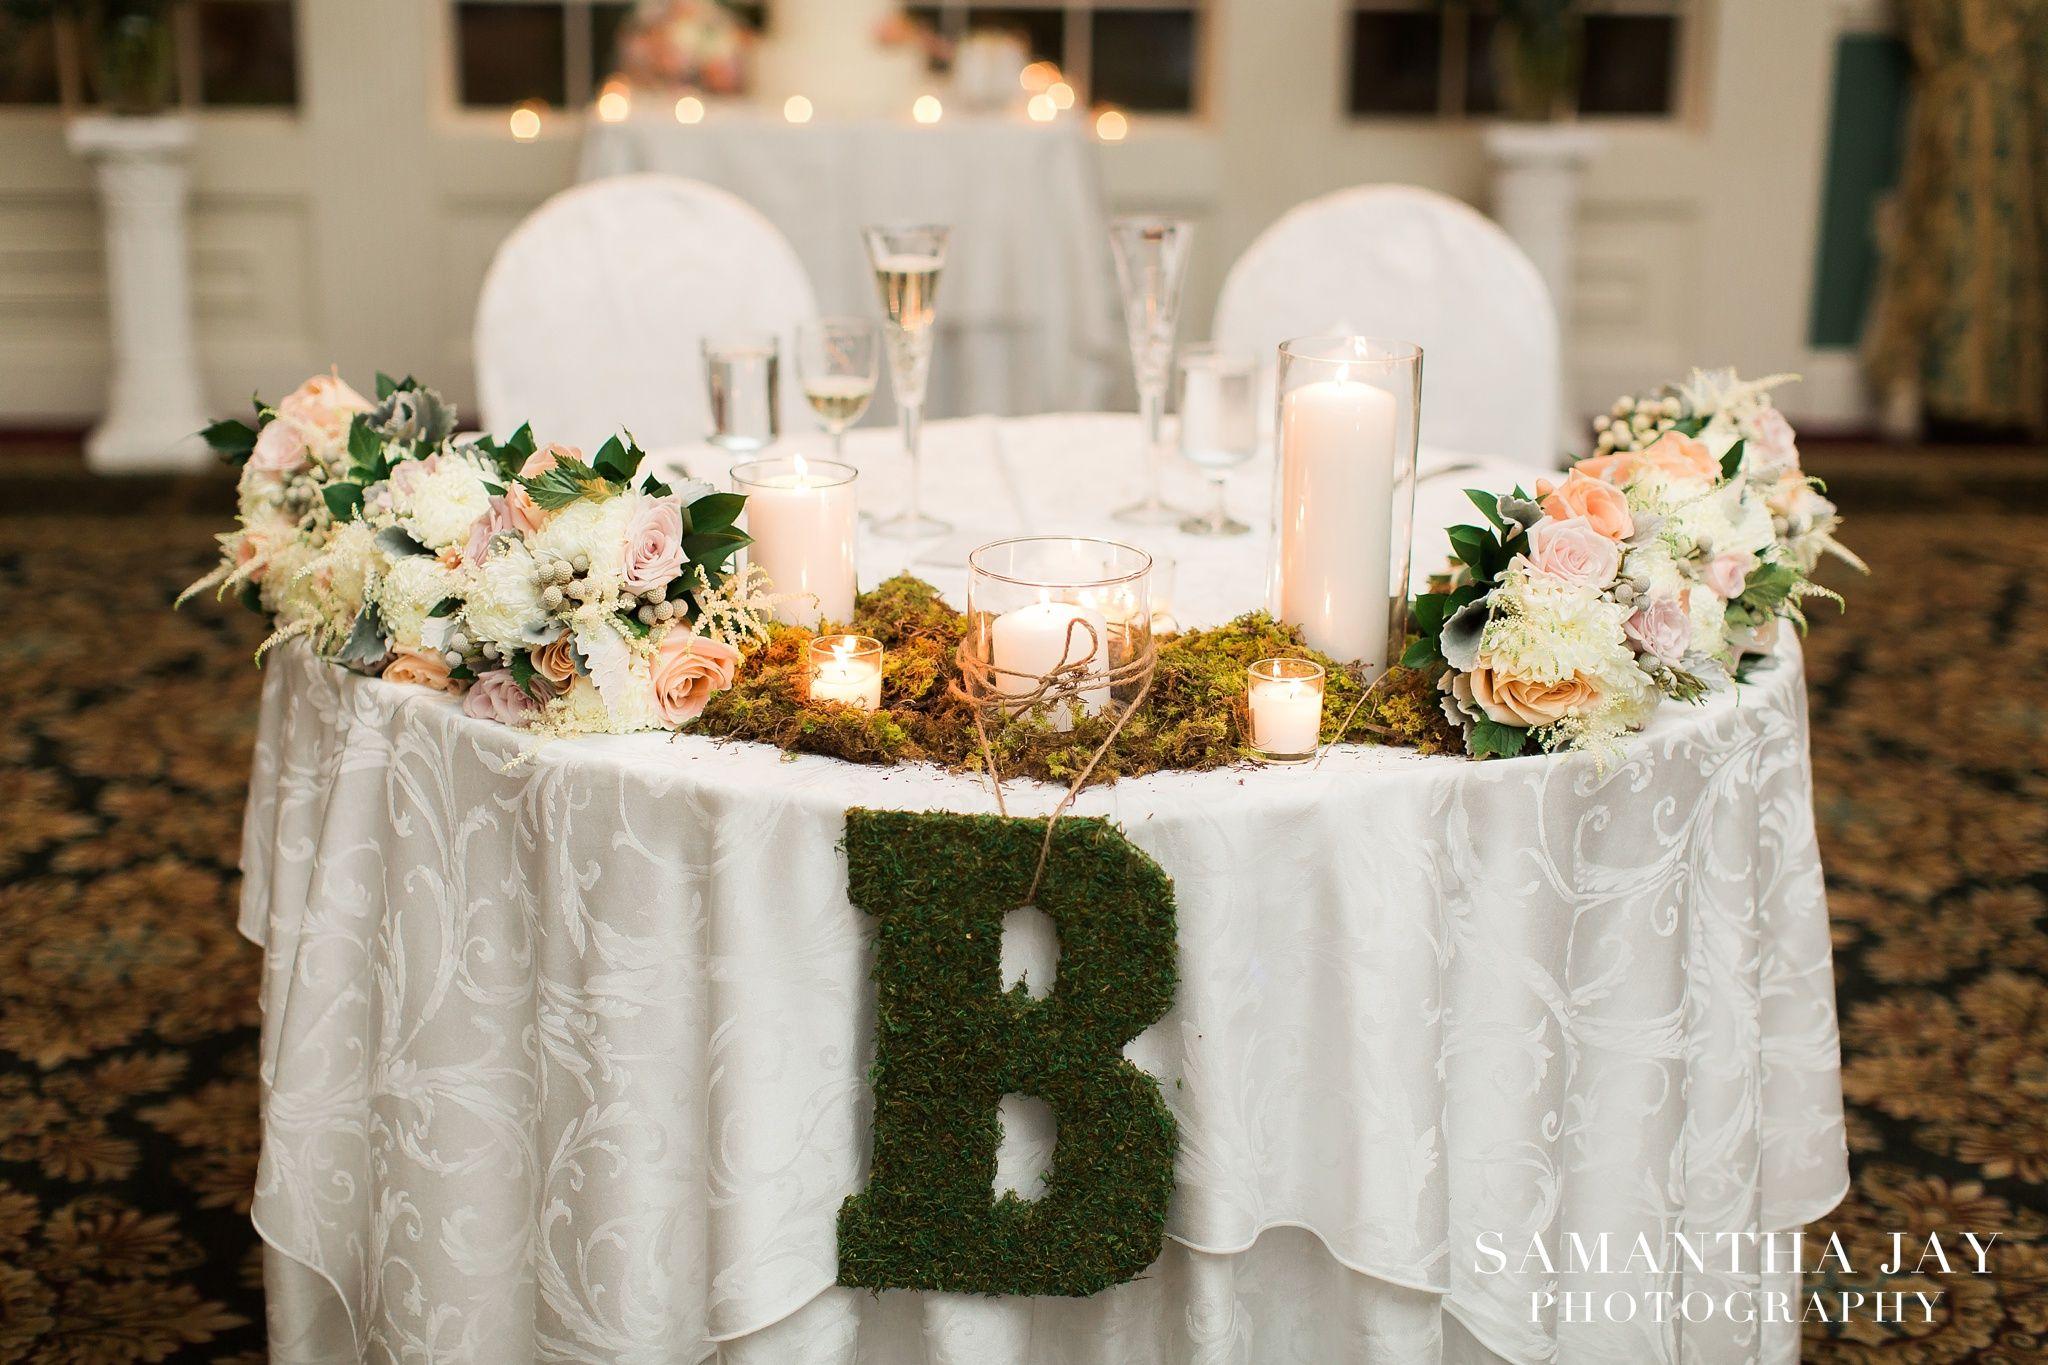 Emerald wedding decor ideas  Gorgeous sweetheart table Photo credit Samantha Jay Photography